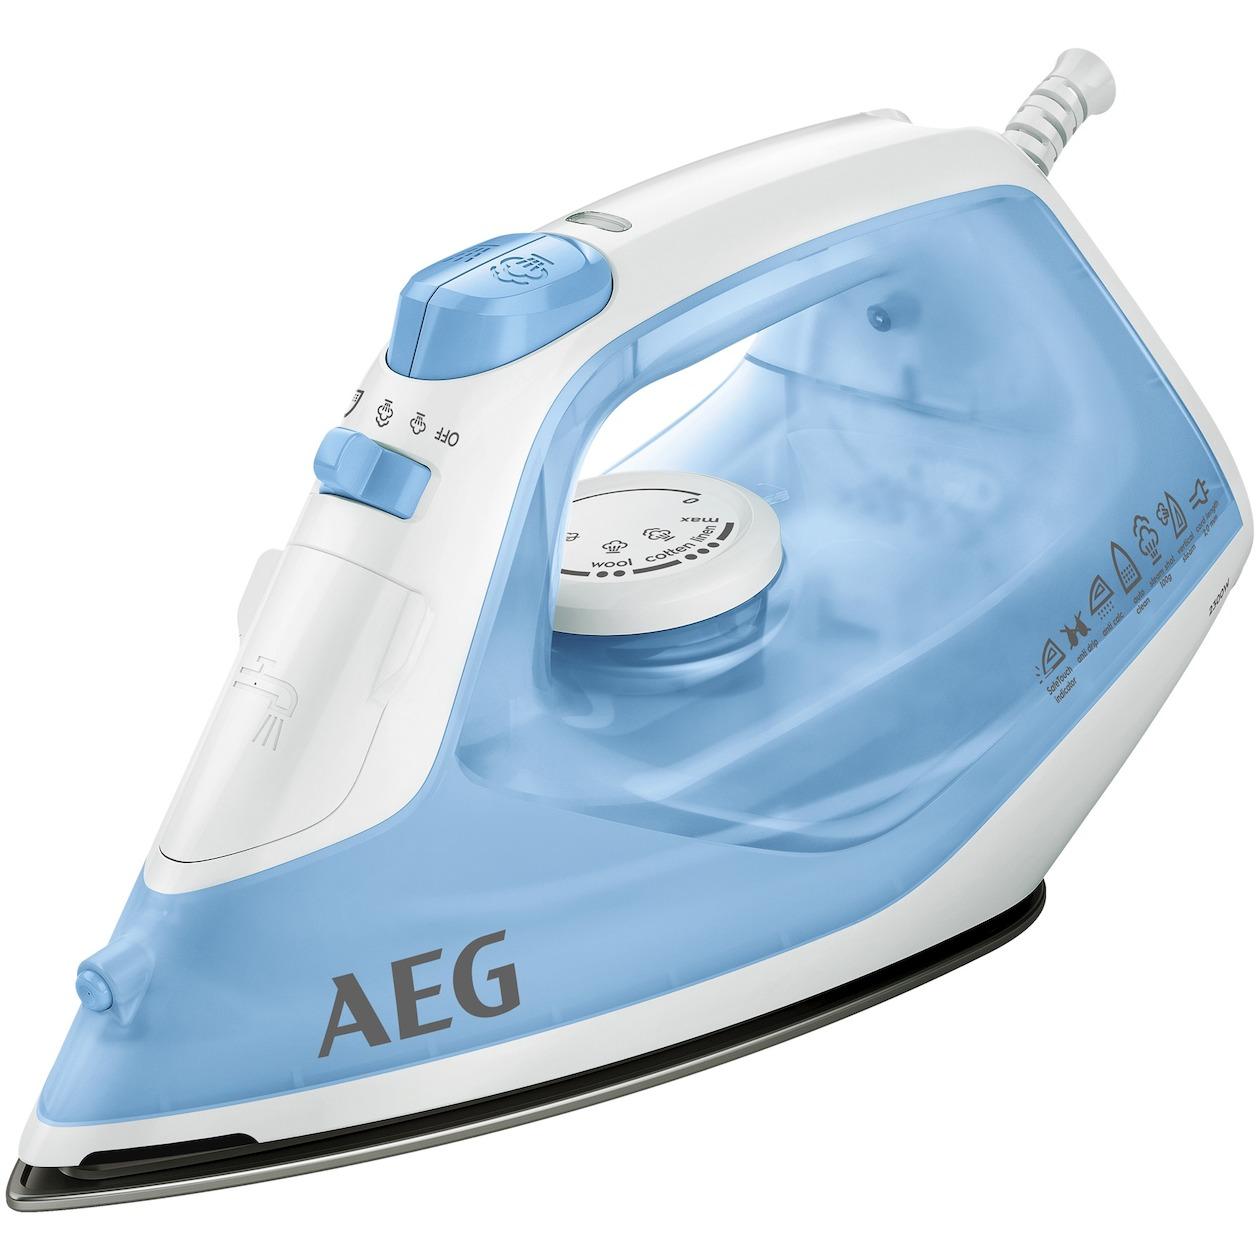 AEG strijkijzer DB1730 blauw